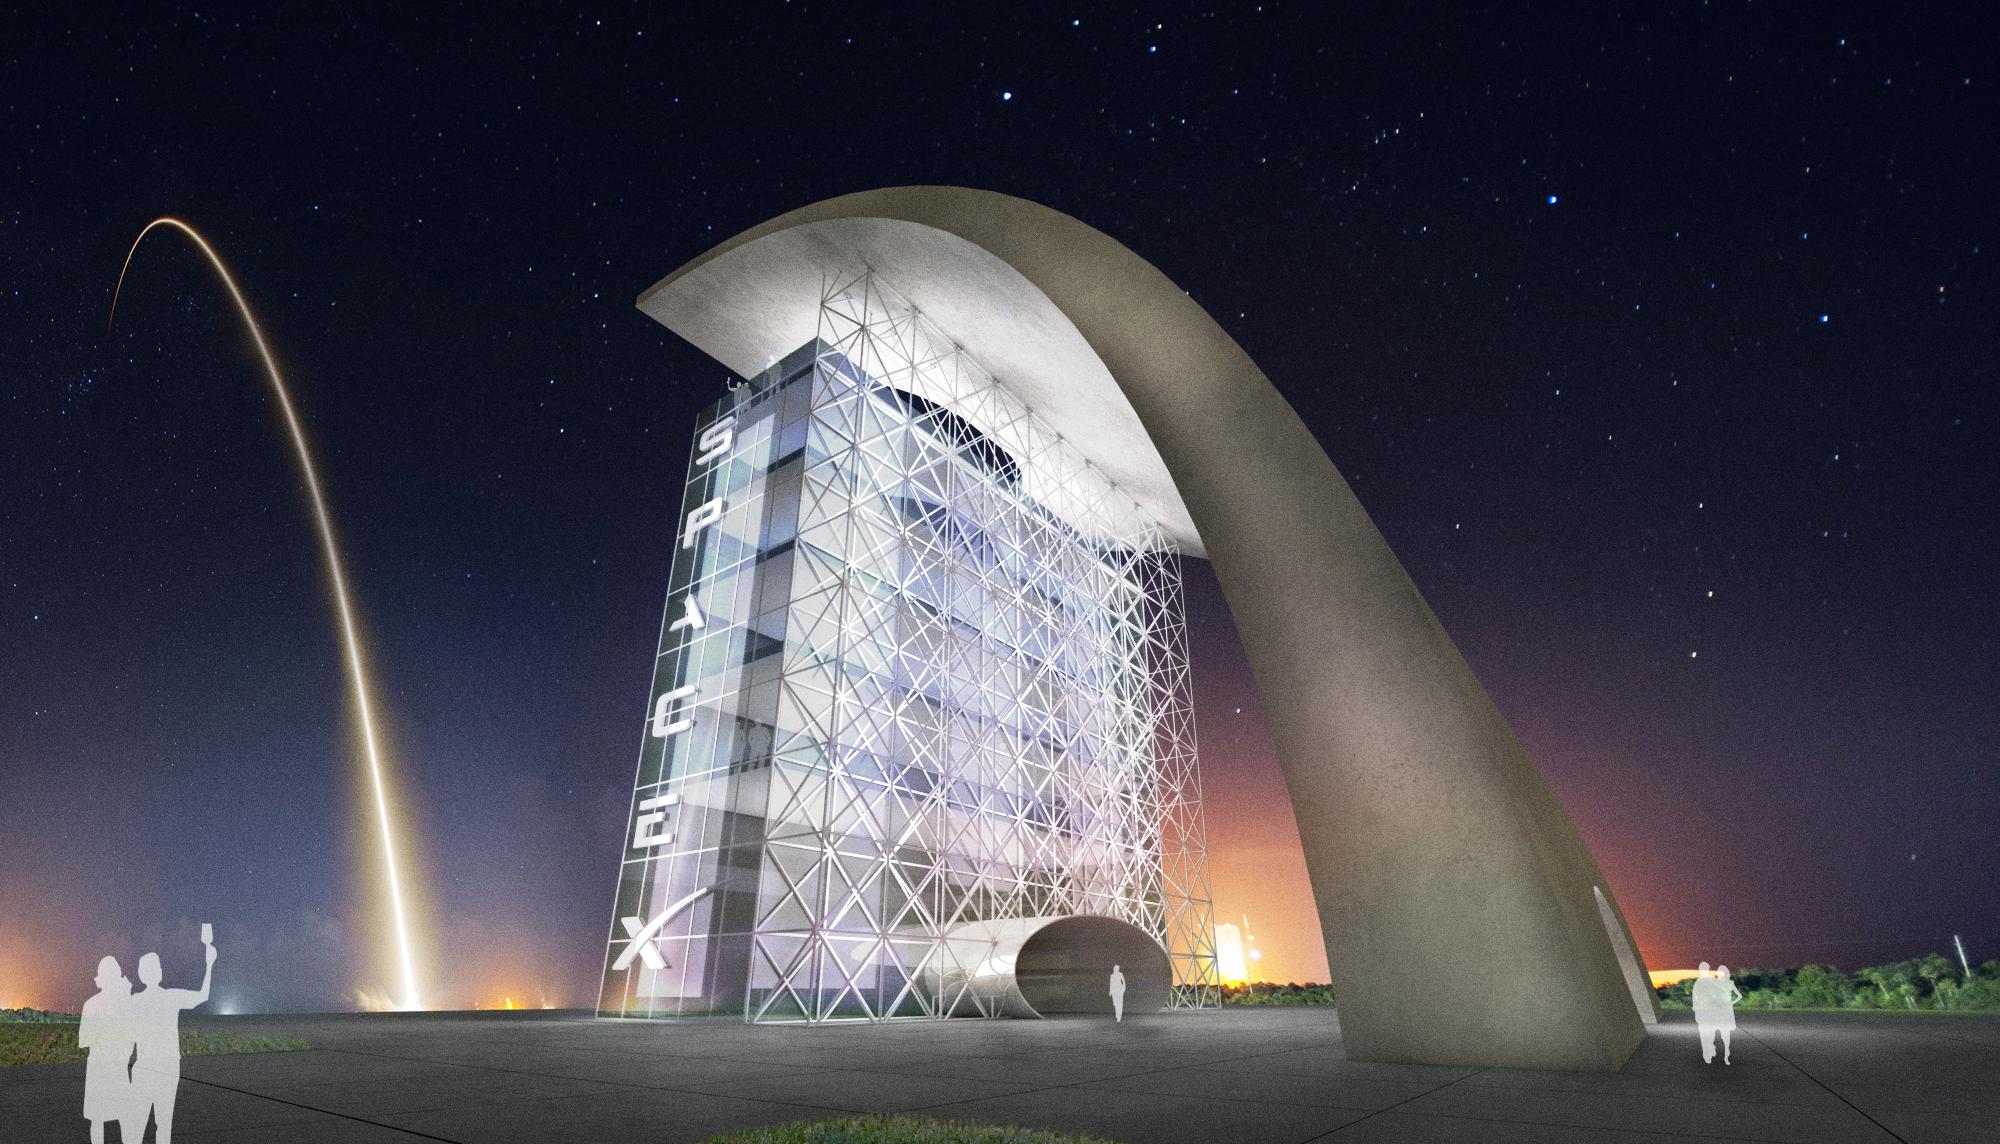 S.E.A.-Studio-Environmental-Architecture-David-Hertz-FAIA-Launch-Facility-Cape-Canaveral-Florida-sustainable-regenerative-restorative-green-design-Spacex-rocket-spaceship-astronaut-cosmos-space-exploration-cosmic-interstellar-tower-cool-rendering-1.jpg